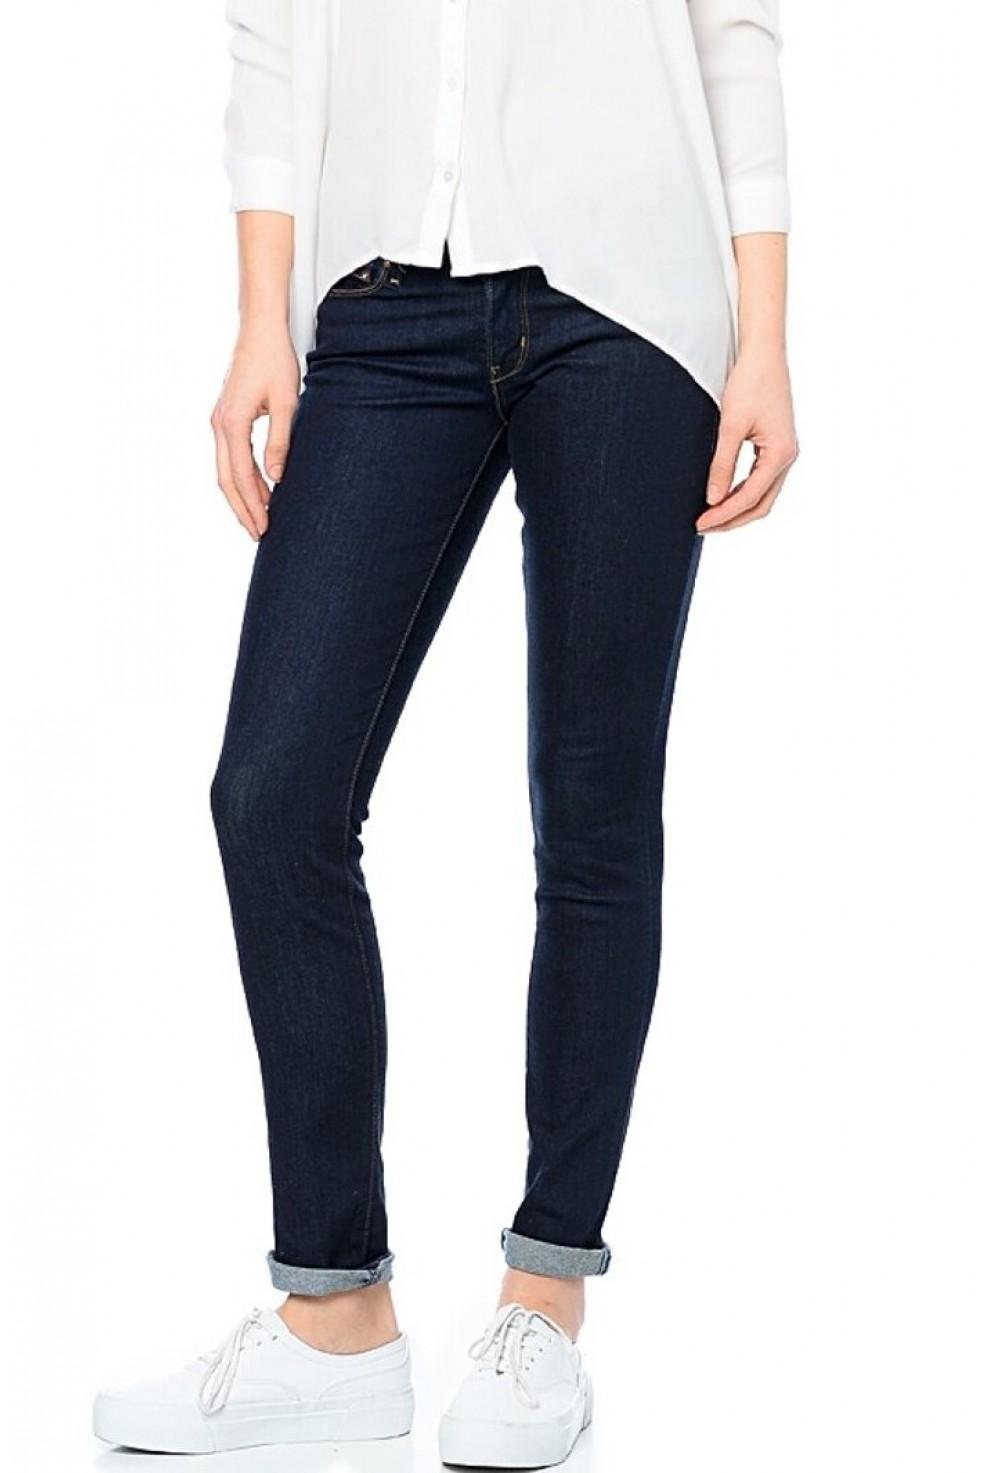 Levis-Bayan-Jean-Pantolon-Demi-Curve-Skinny-05703-0447